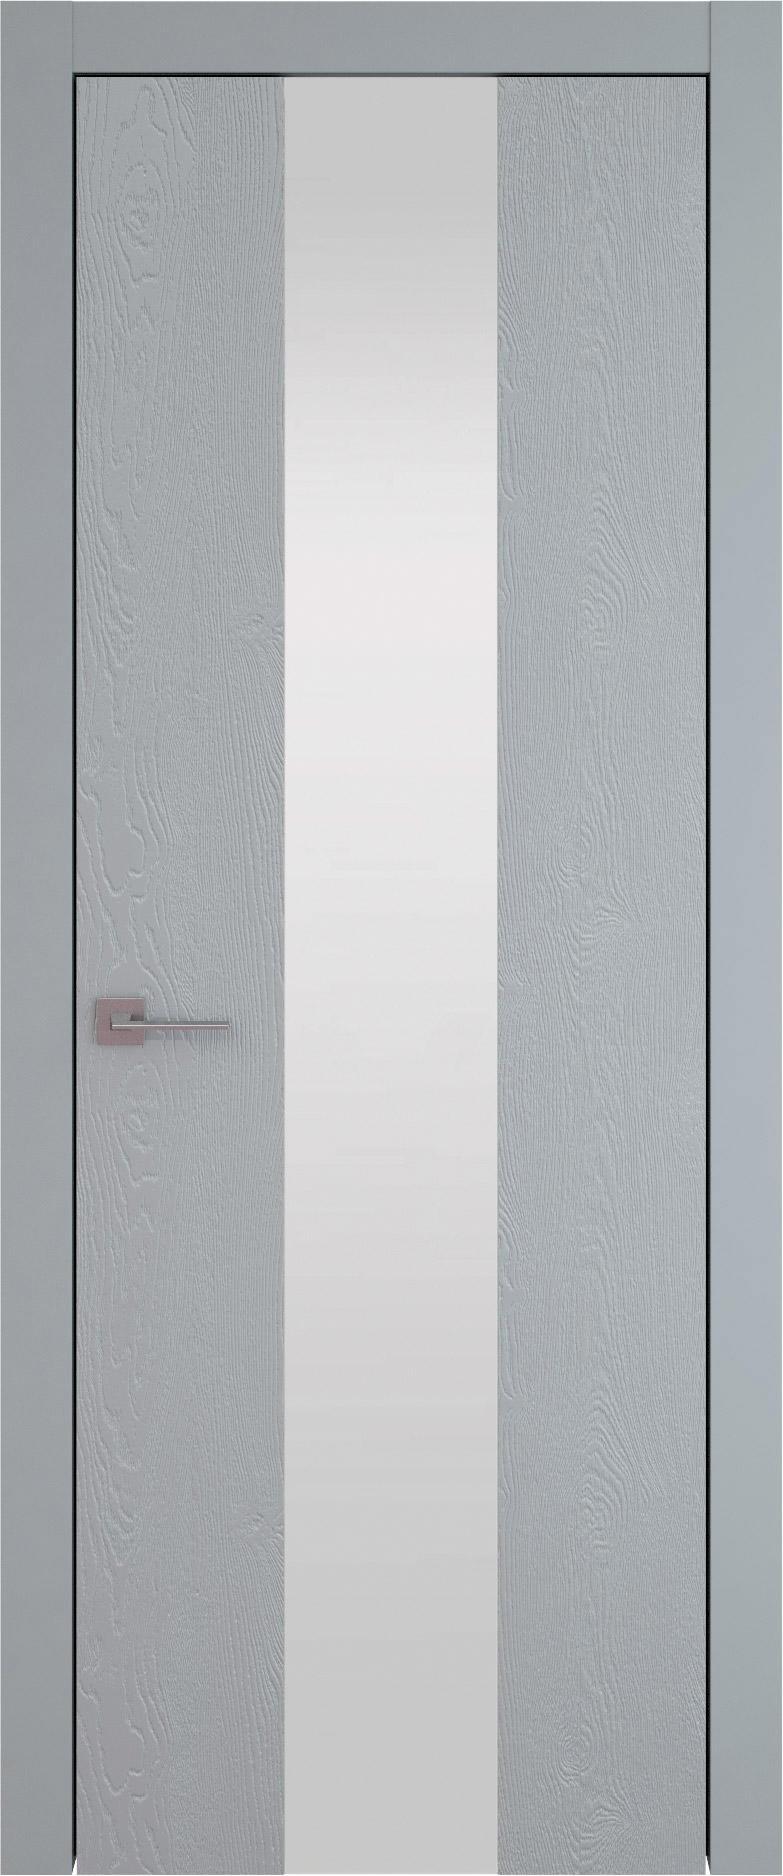 Tivoli Ж-1 цвет - Серебристо-серая эмаль по шпону (RAL 7045) Со стеклом (ДО)